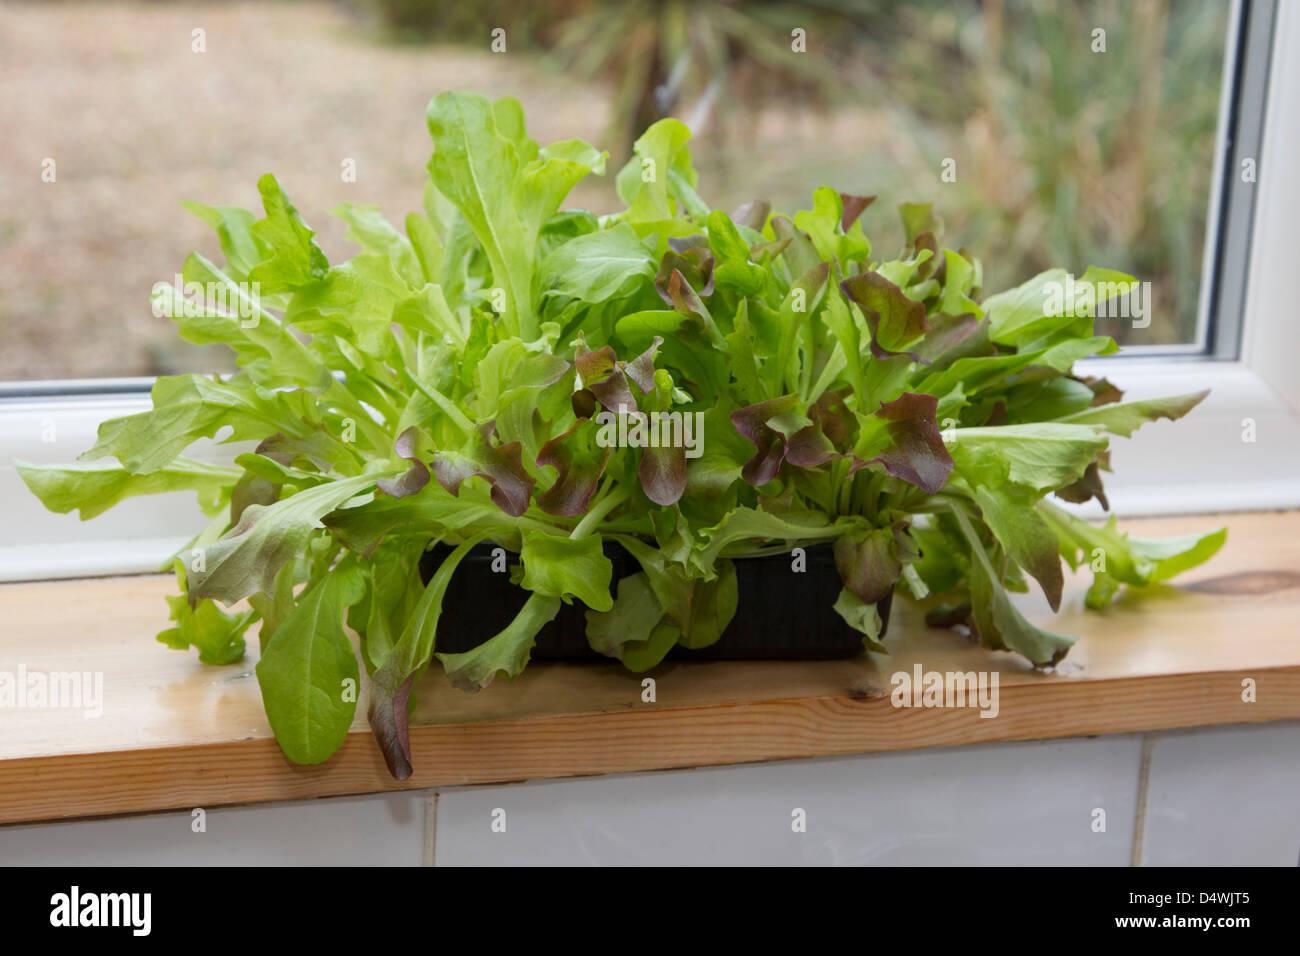 Living salad on a windowsill - Stock Image